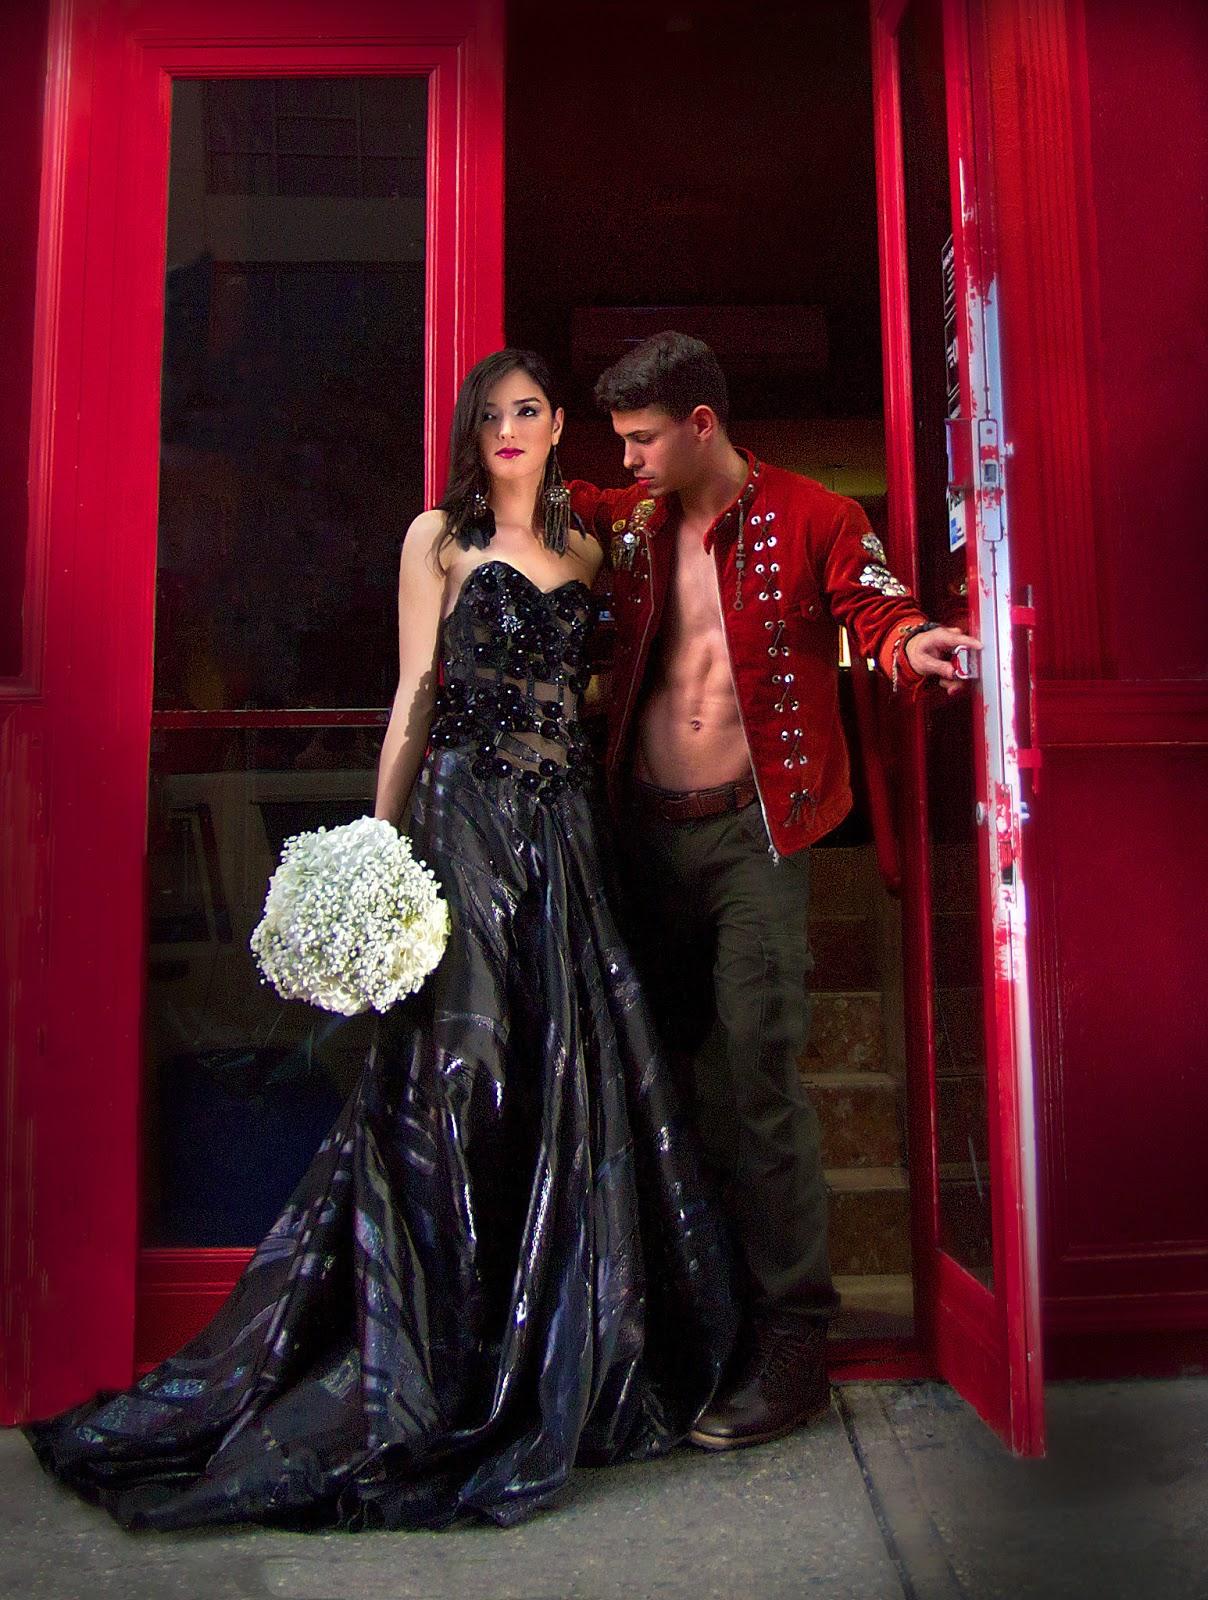 Speedlight Wedding Photography: Sexy Bride II: Wedding Photography With Speedlights, LED